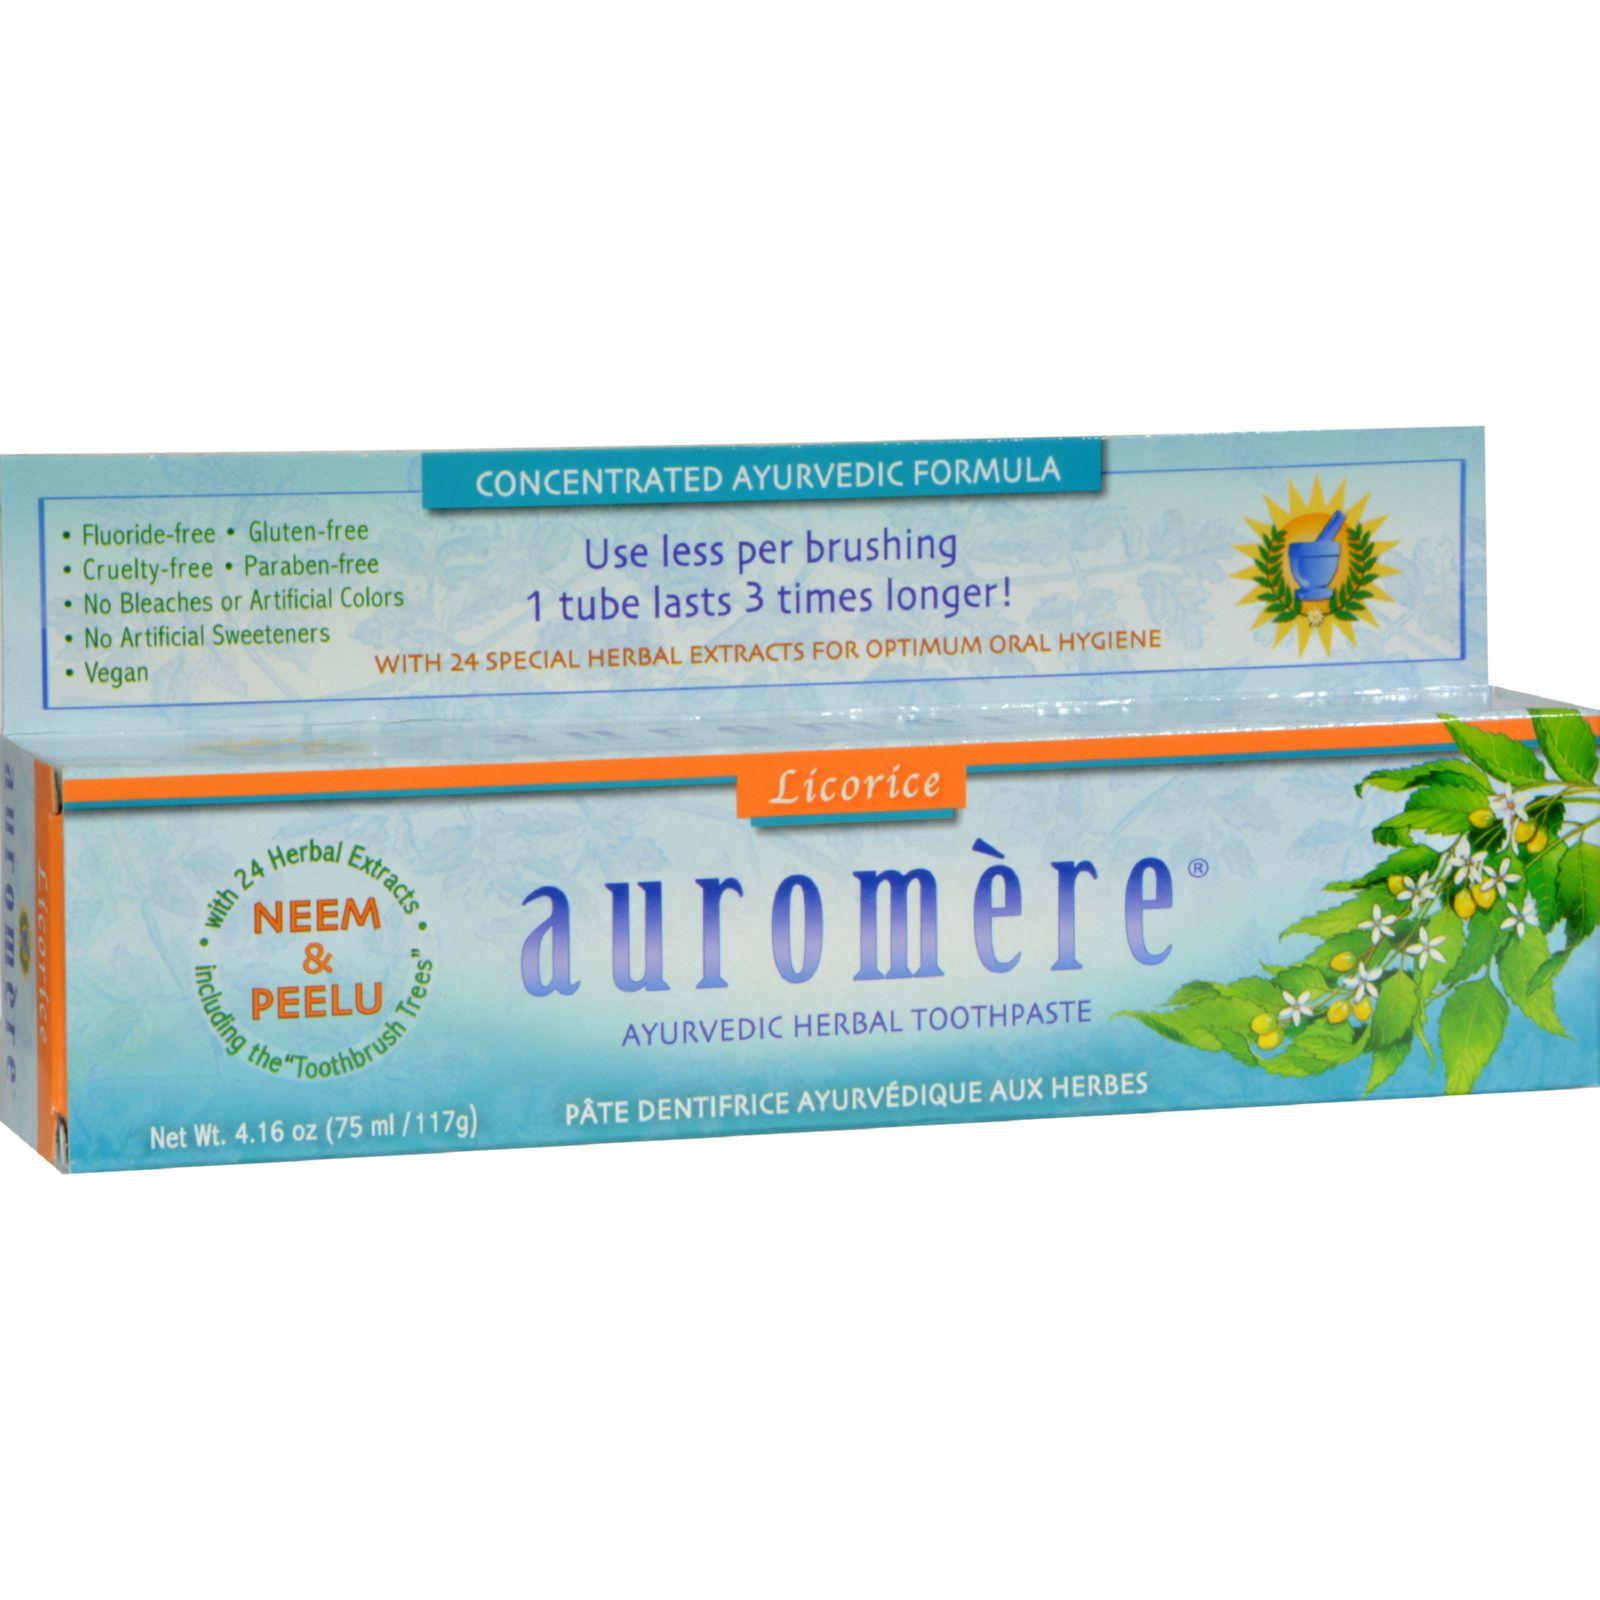 Auromere Herbal Toothpaste Original Licorice - 4.16 oz - Case of 12